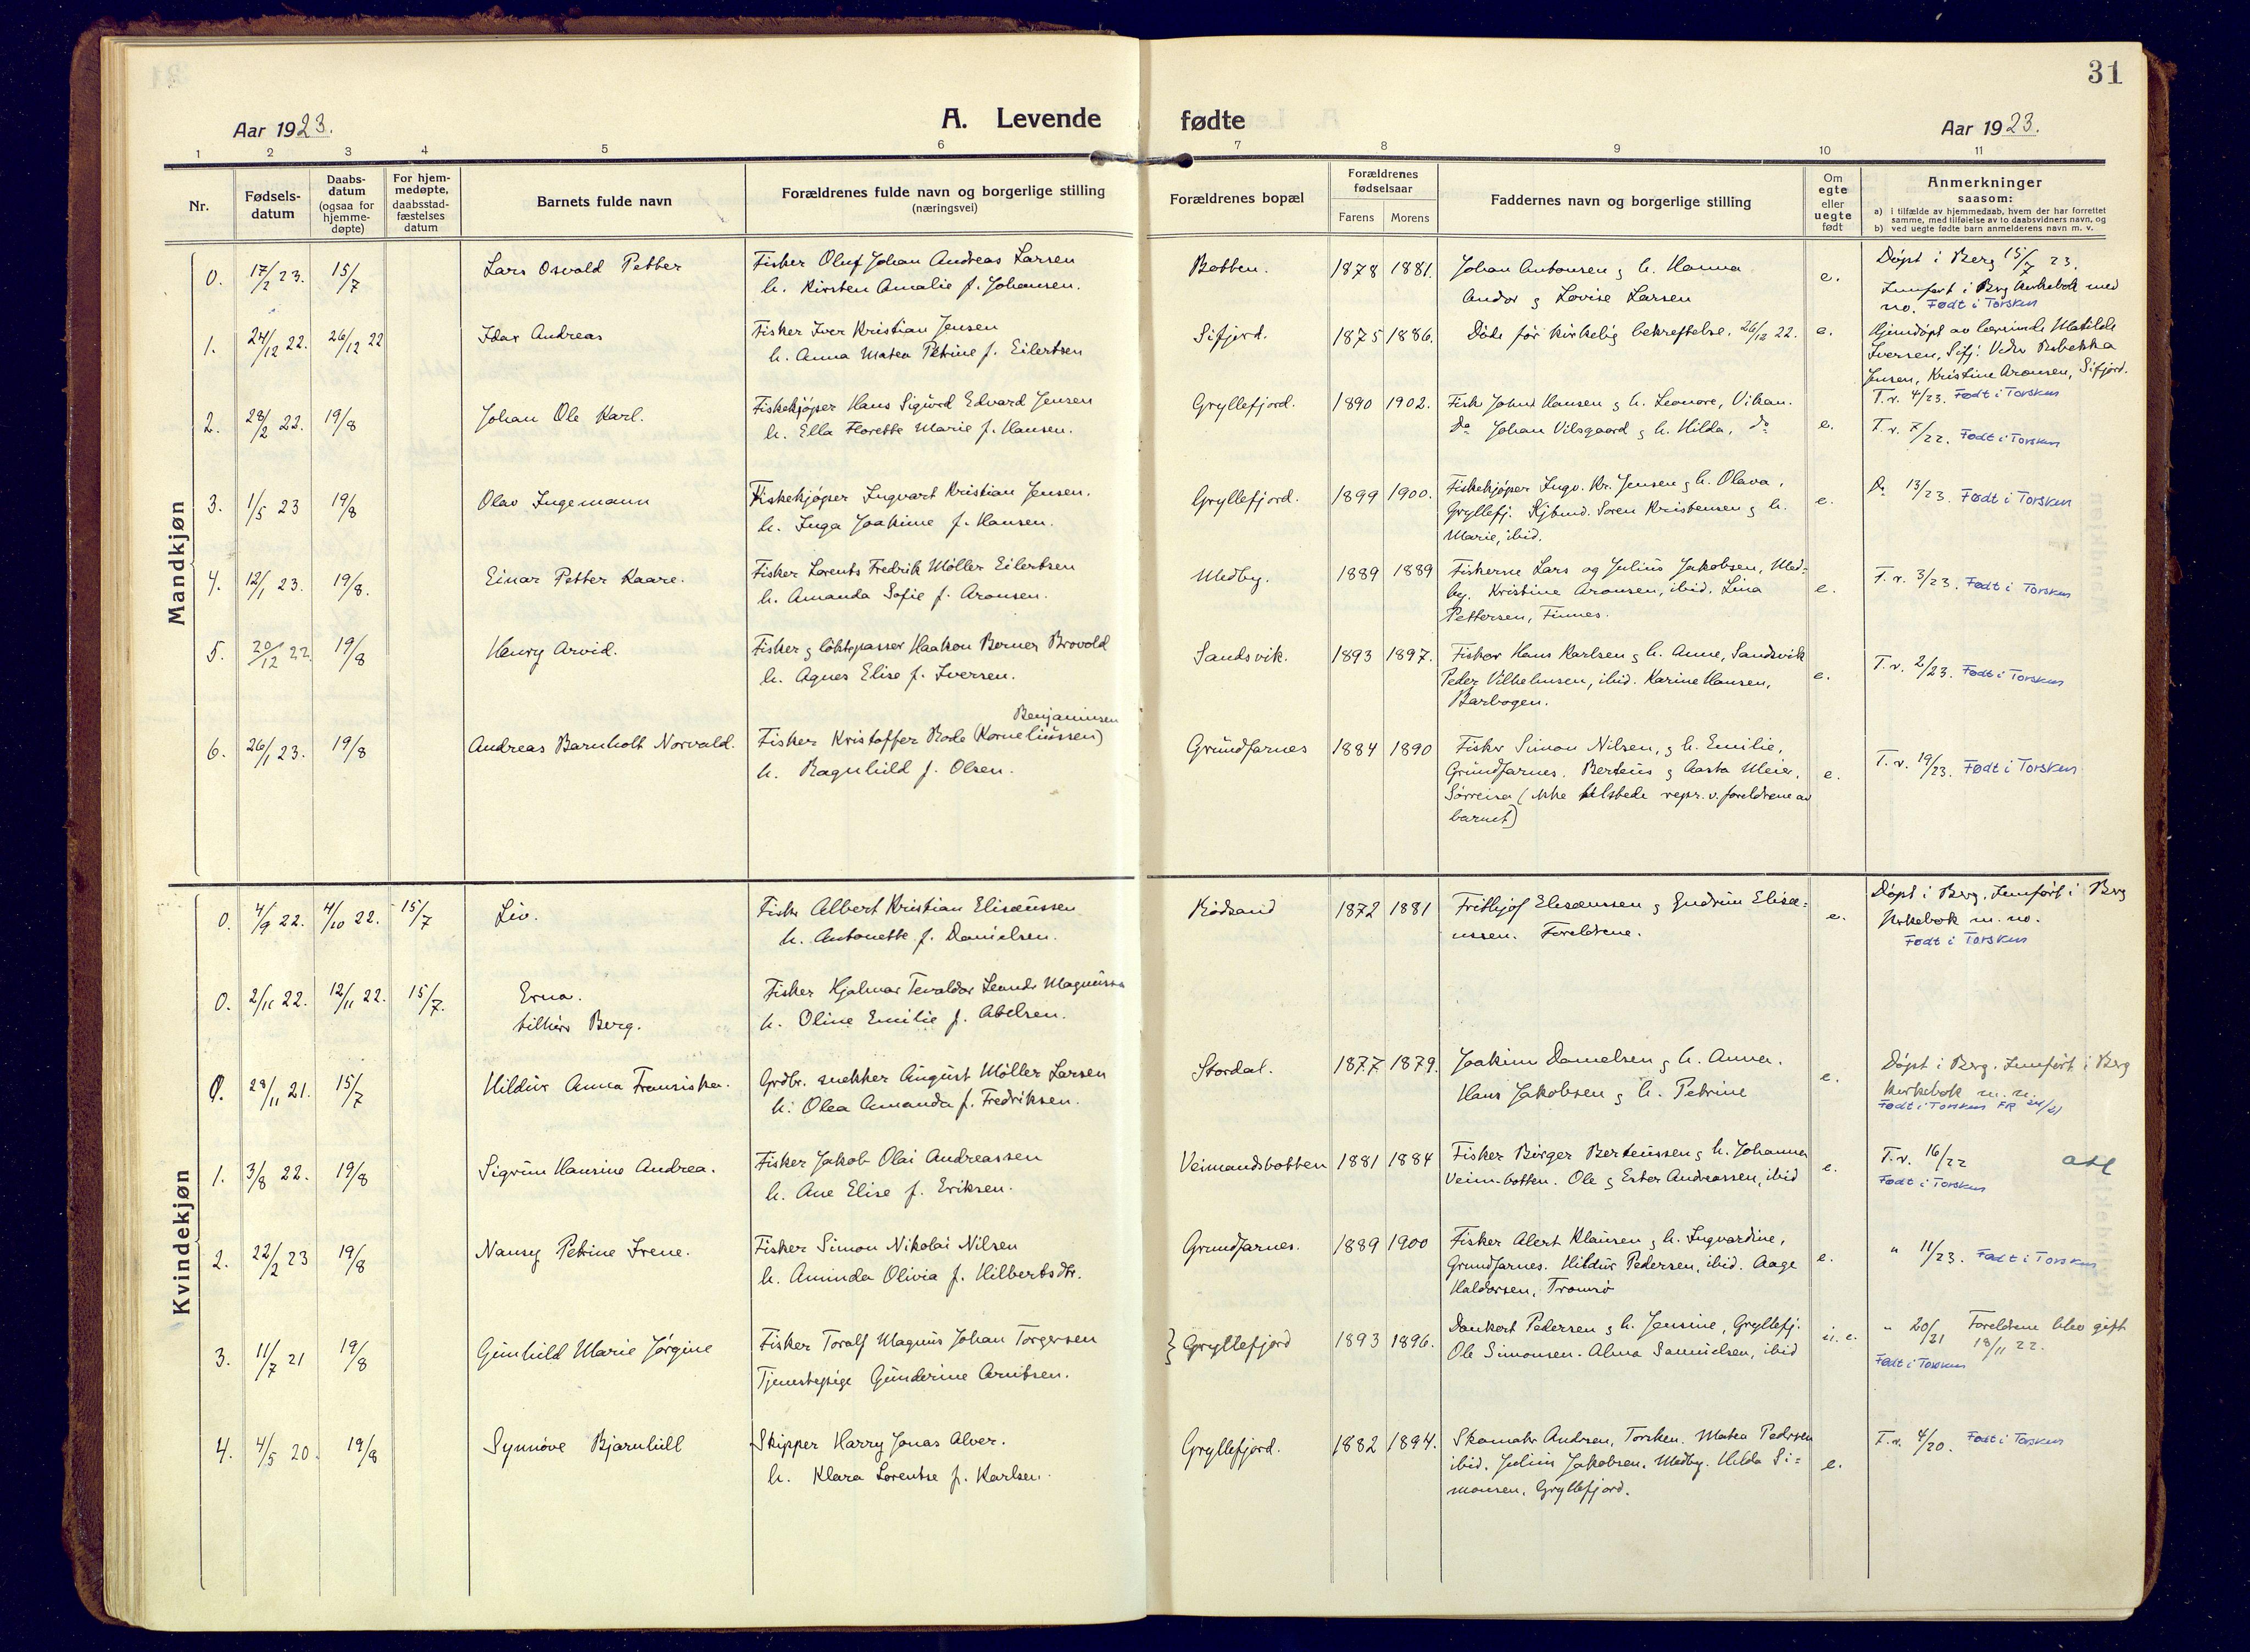 SATØ, Mefjord/Berg sokneprestkontor, G/Ga/Gaa: Ministerialbok nr. 10, 1916-1928, s. 31